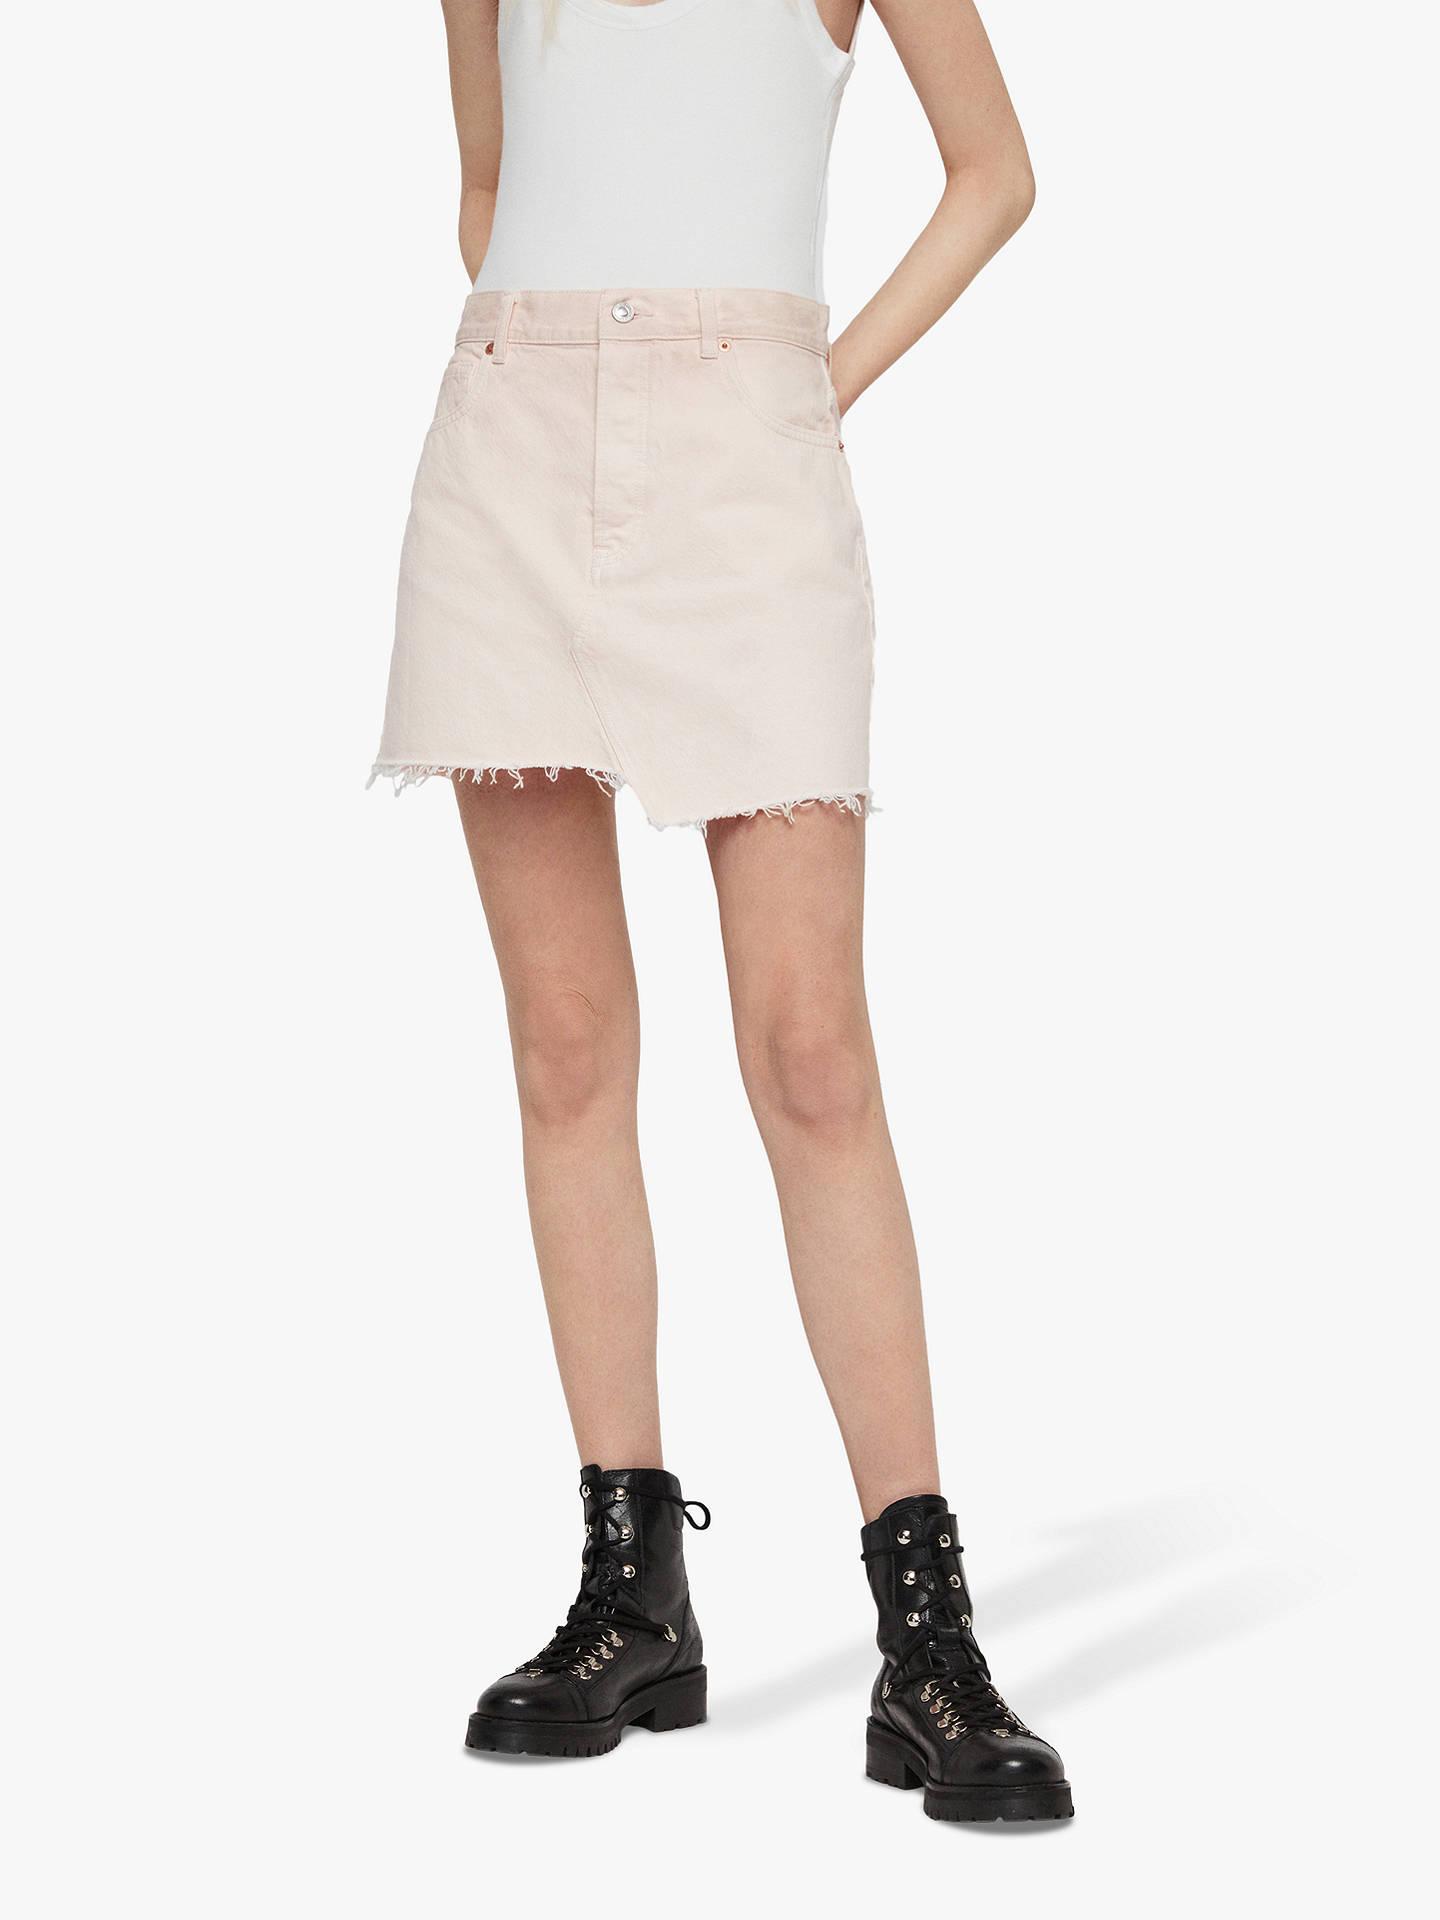 50e6d8539f Buy AllSaints Mai Denim Skirt, Pale Pink, 6 Online at johnlewis.com ...